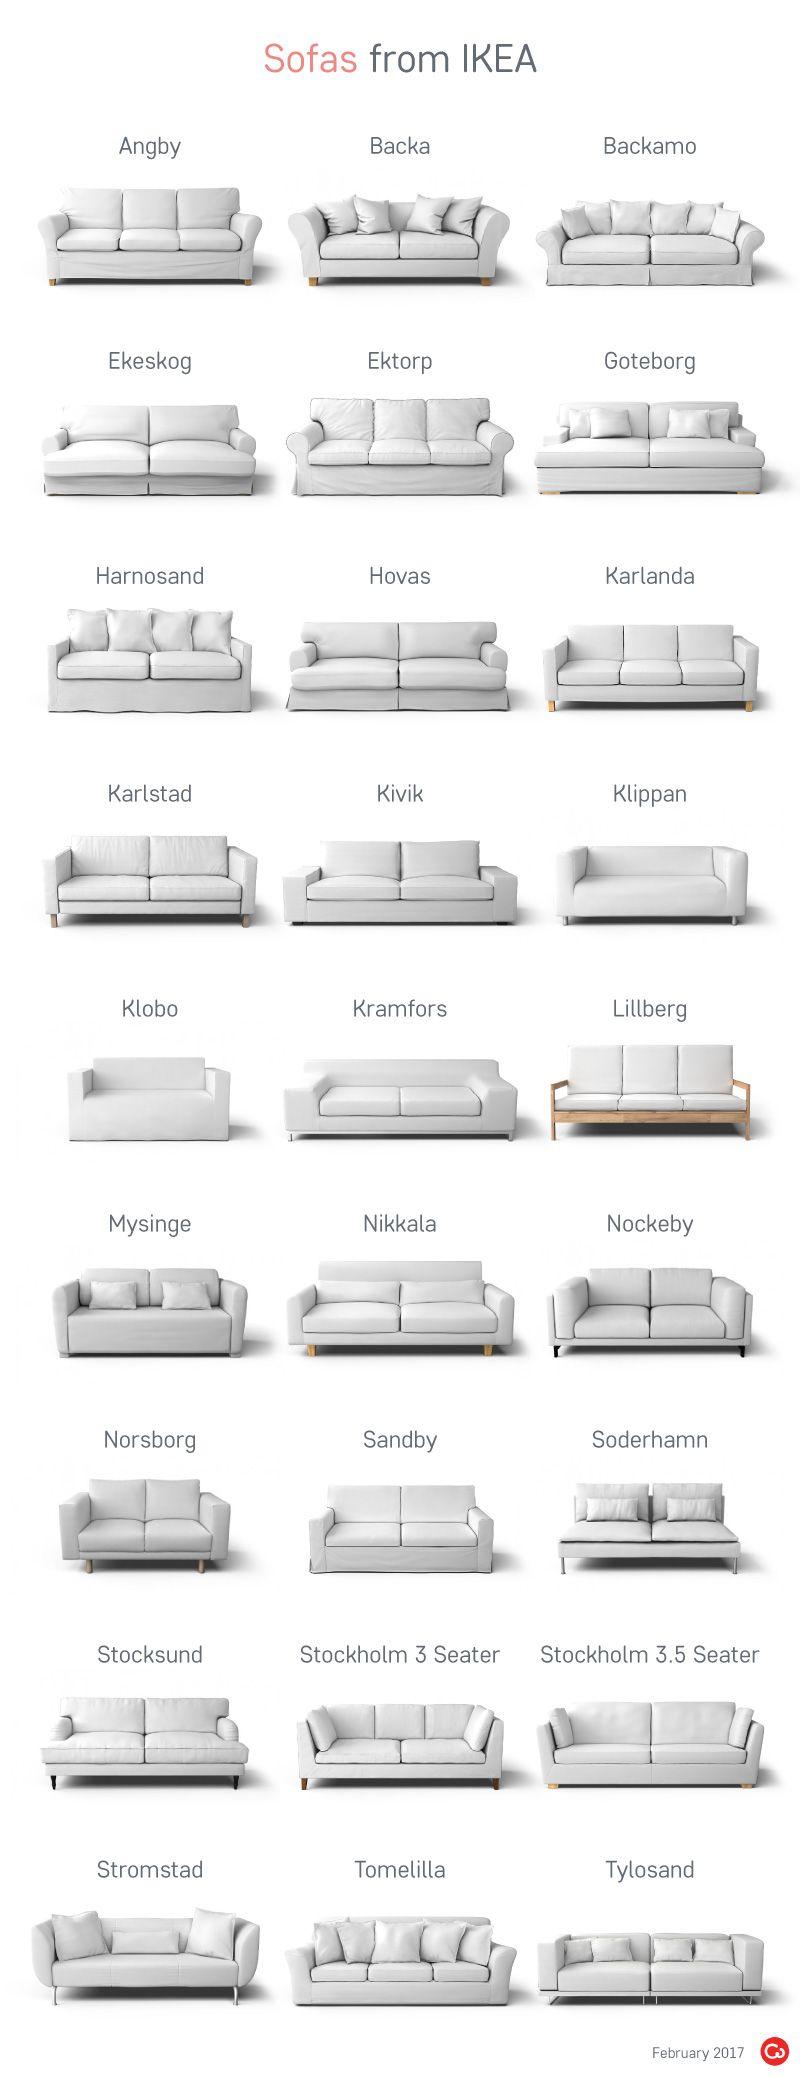 Fundas Sofa Ikea Descatalogados.Fundas Personalizadas Para Modelos Antiguos De Sofas Ikea